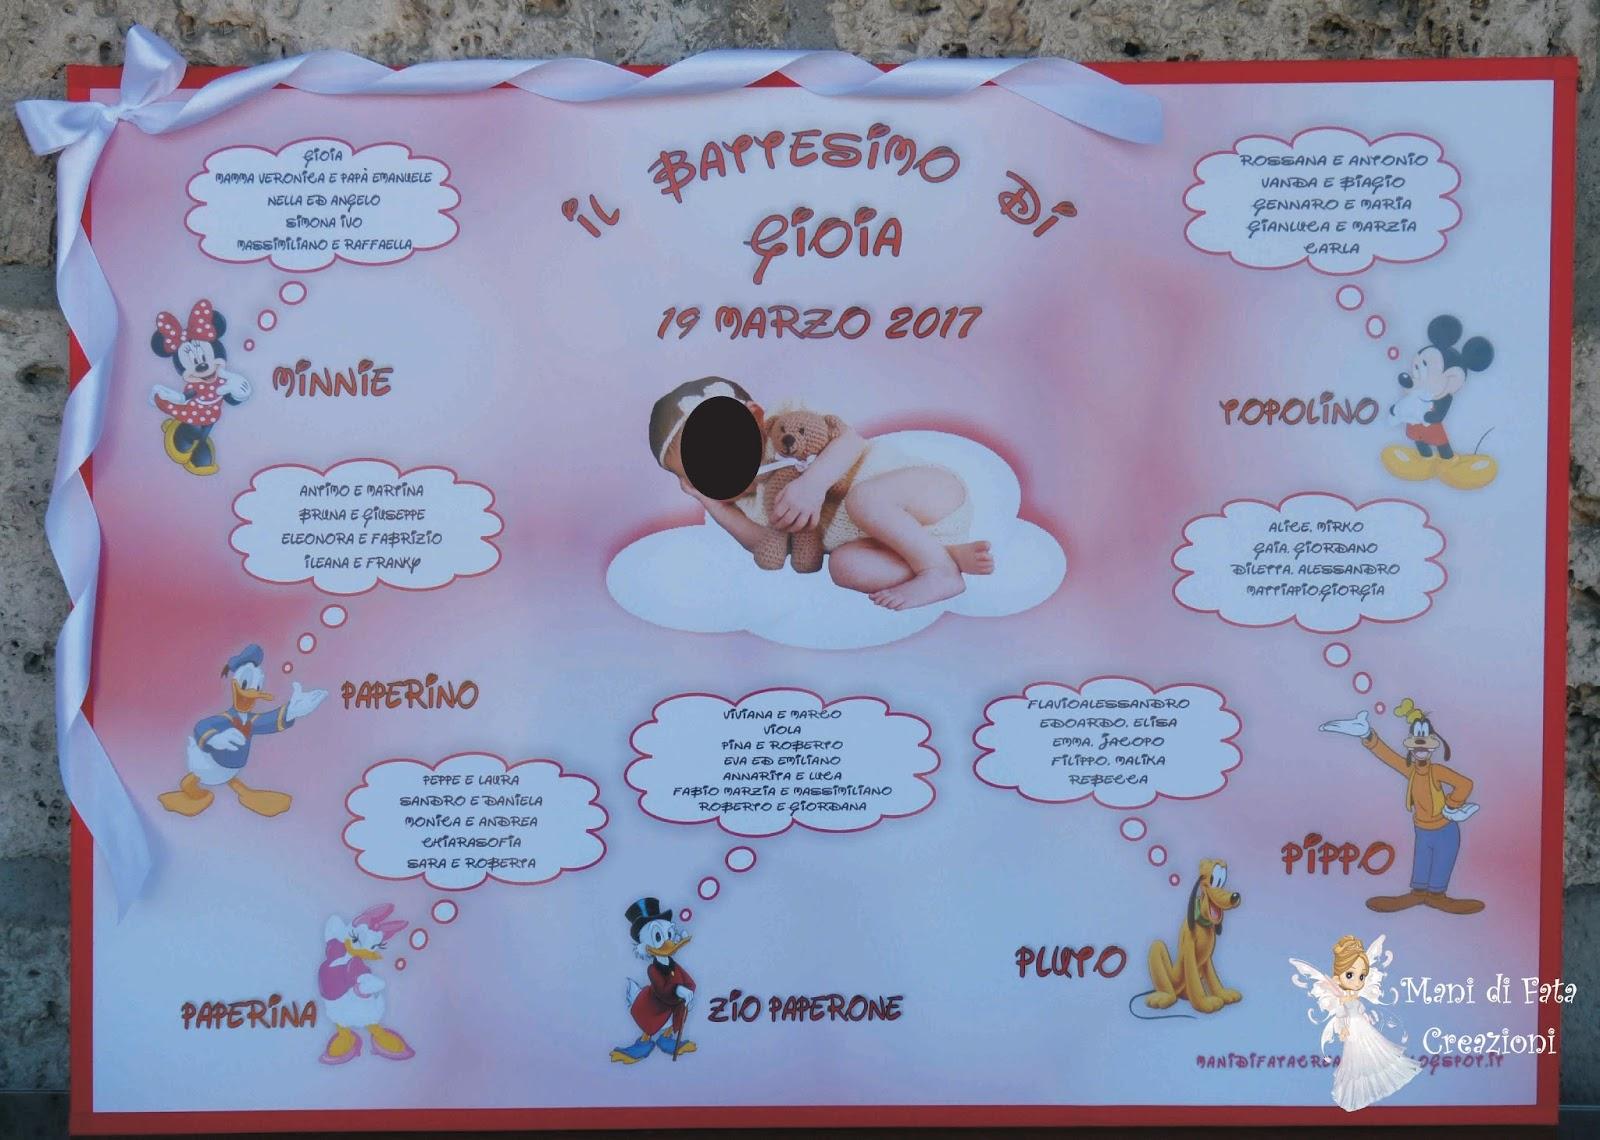 Amato Mani di Fata Creazioni: Tableau Battesimo Disney FD15